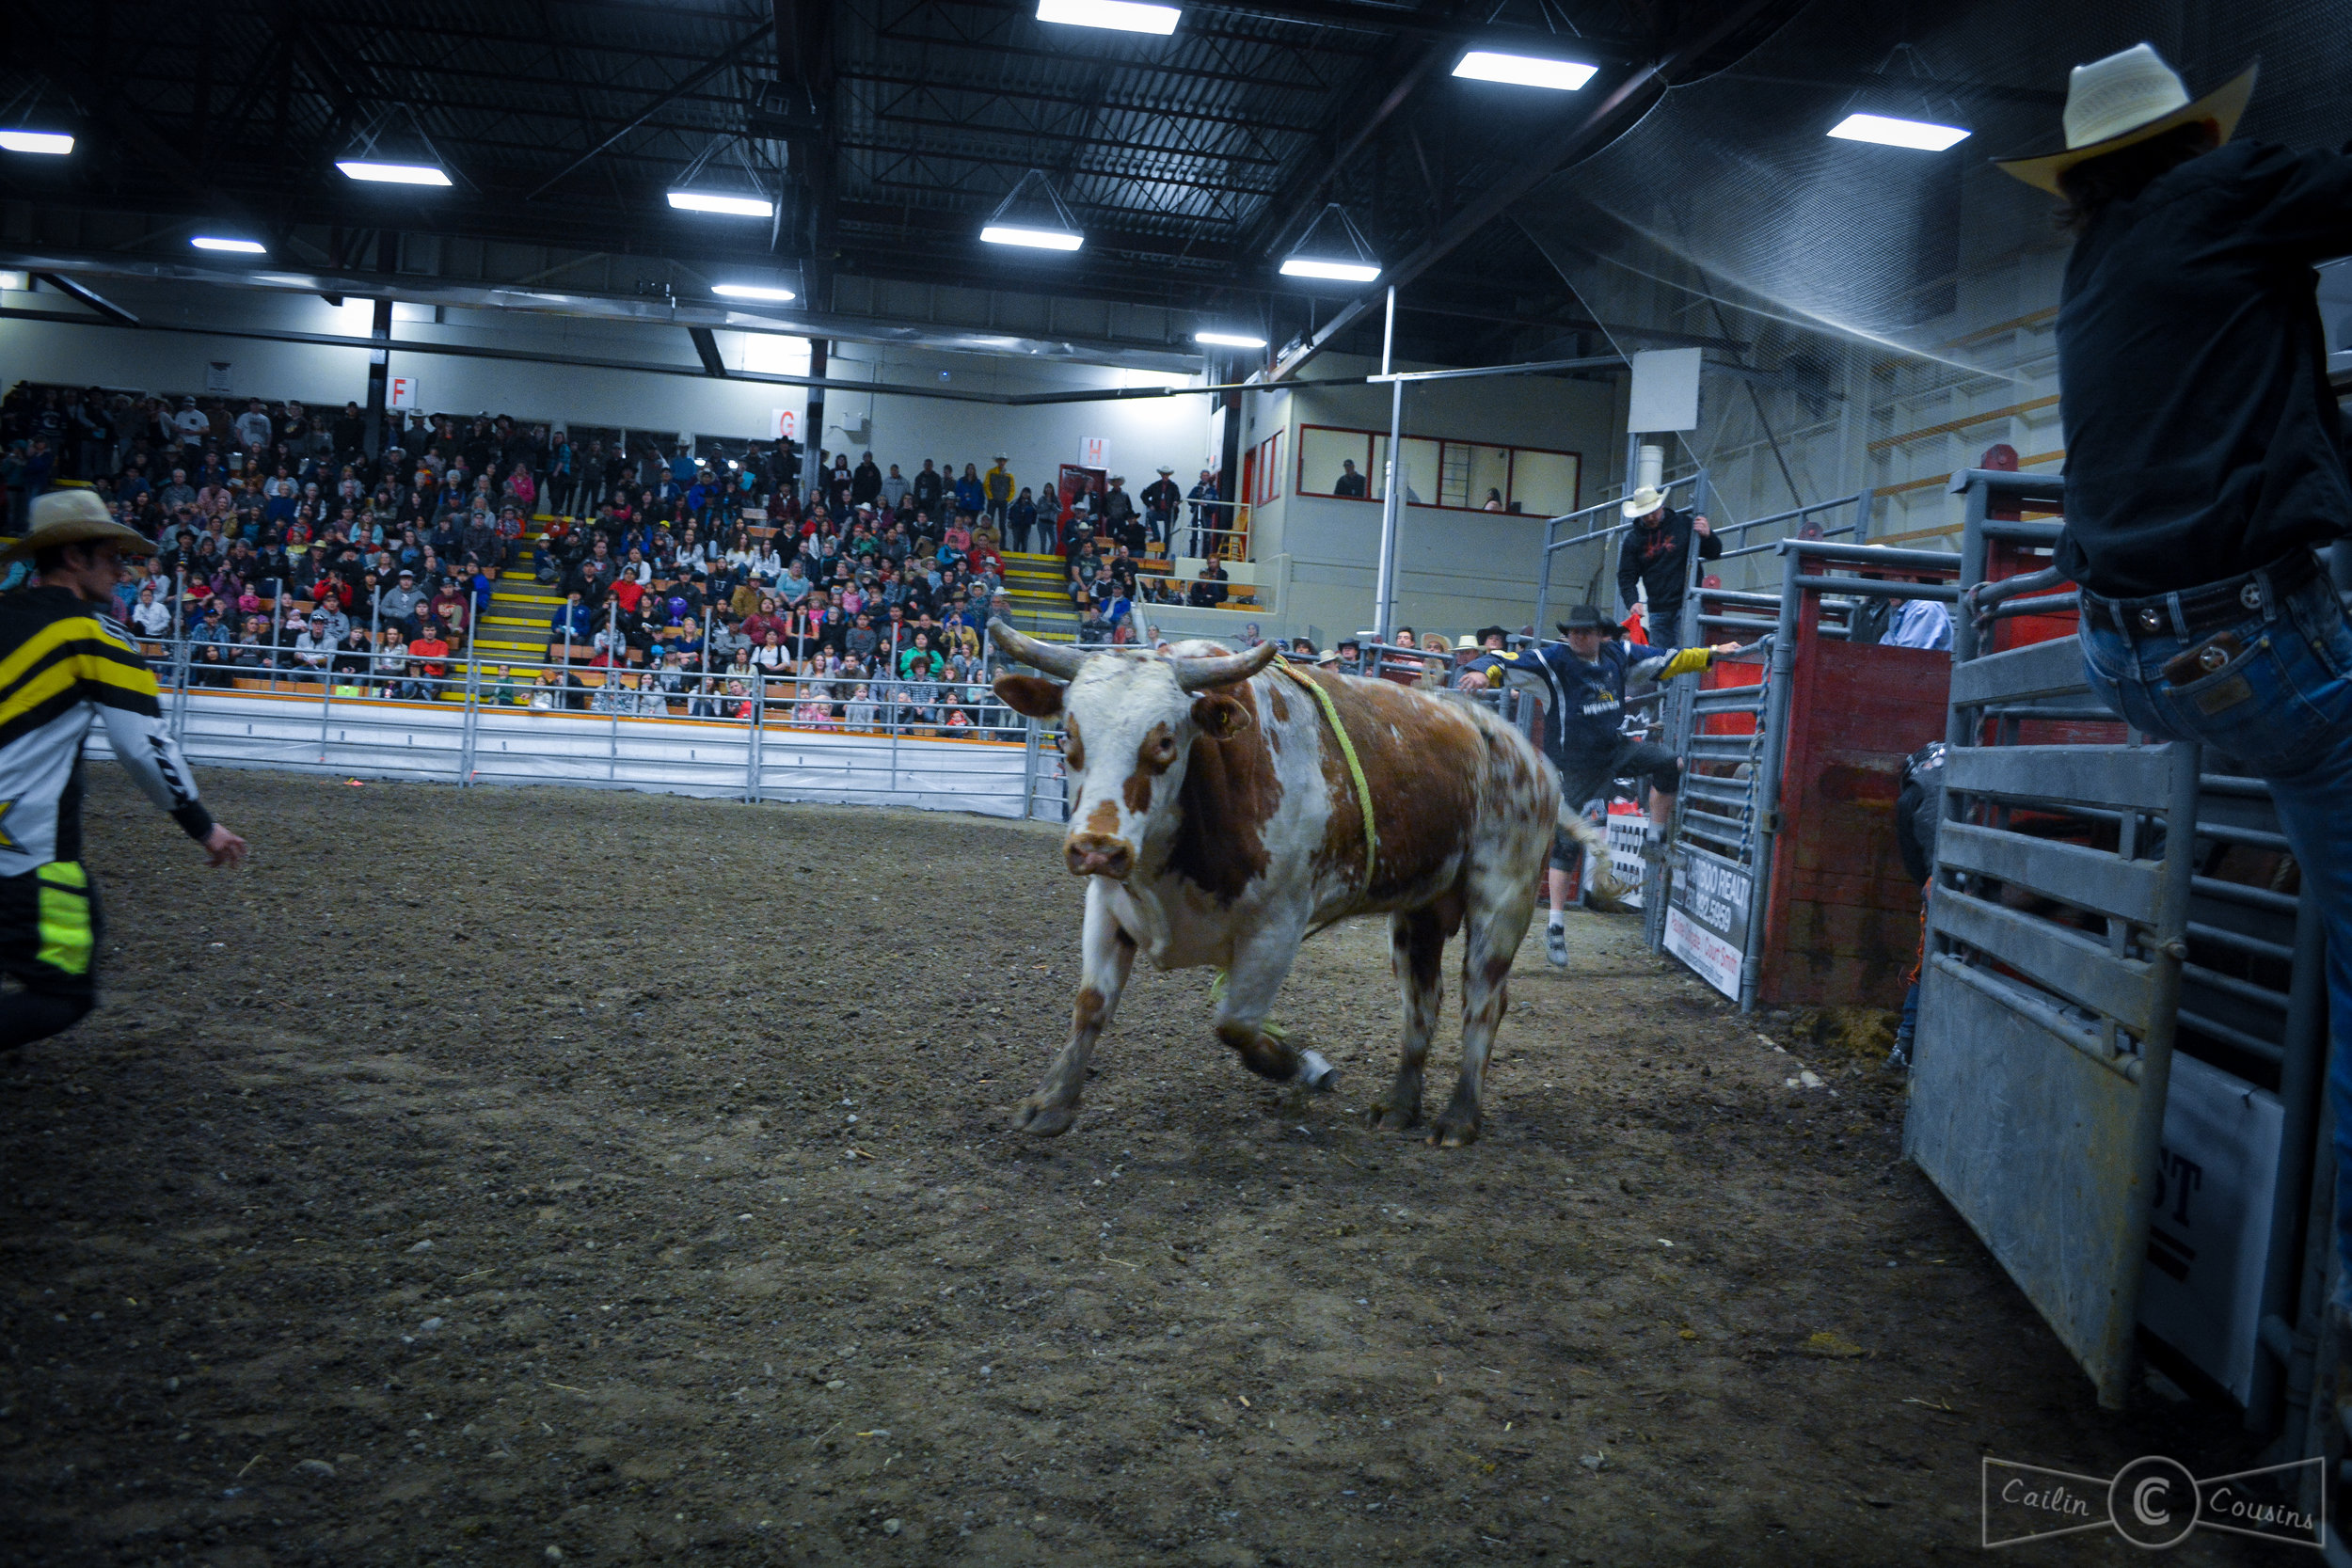 051715_rodeo_cc.jpg